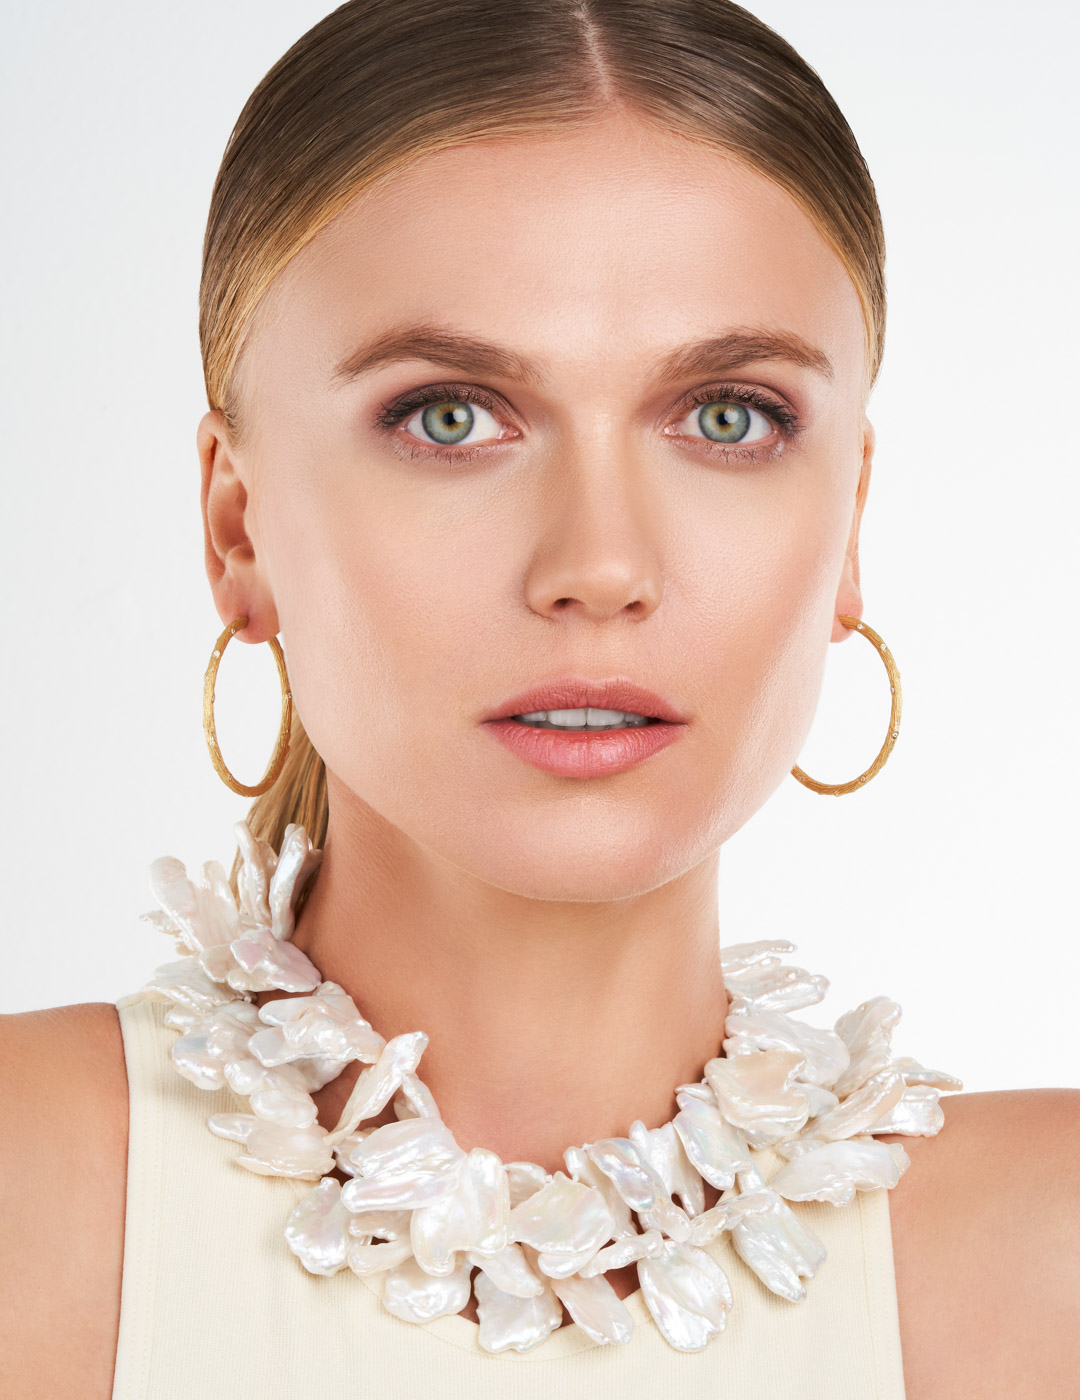 mish_products_earrings_Twig-XL Hoop YG-ER-3